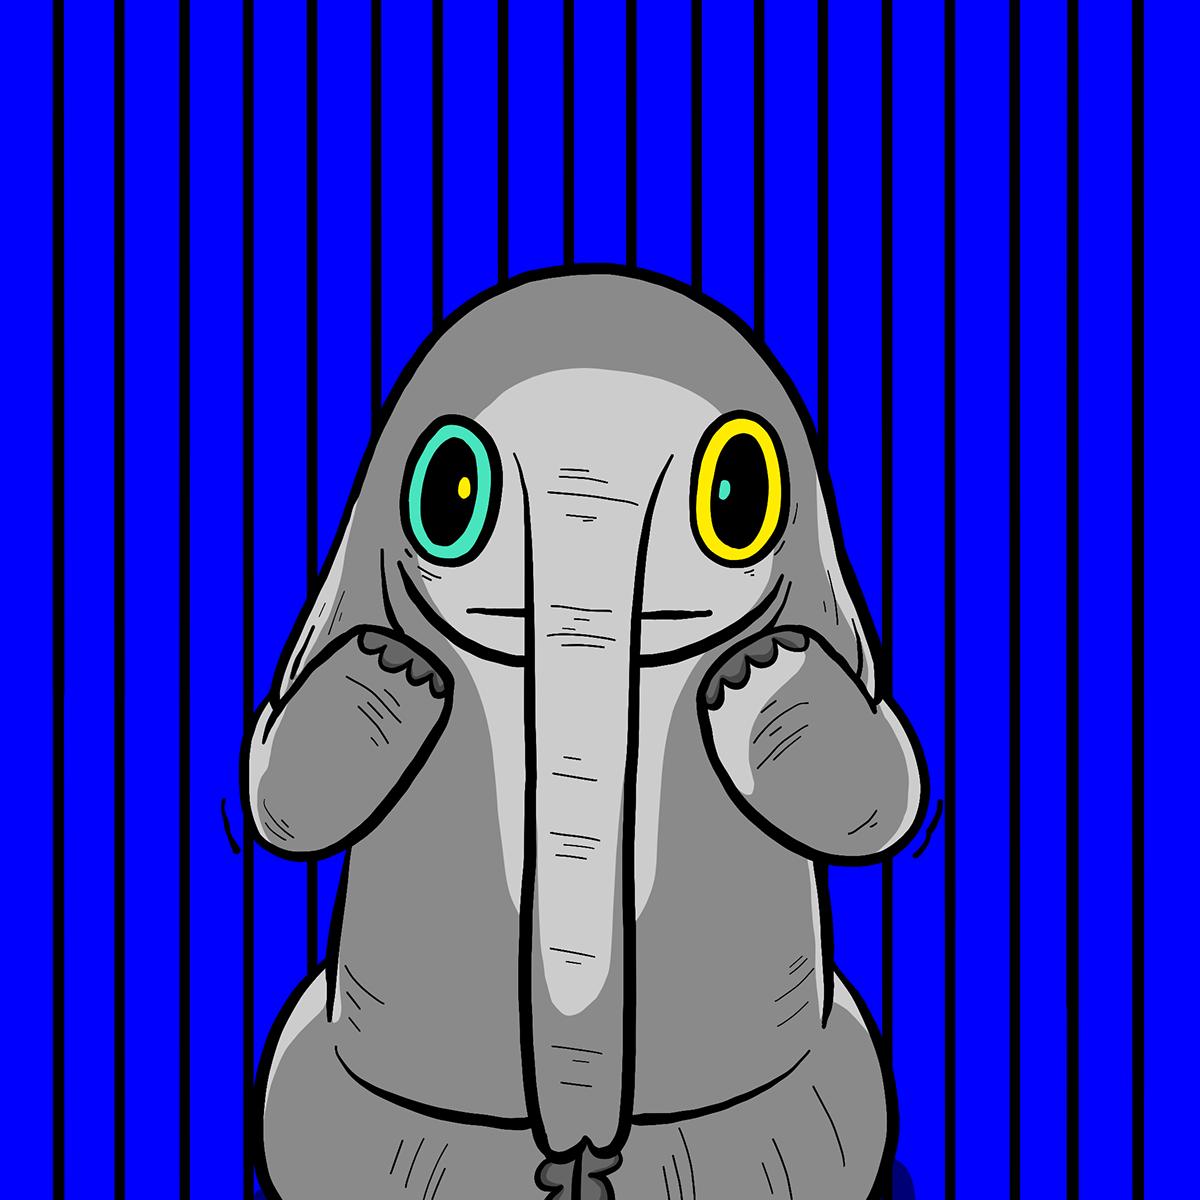 Image may contain: cartoon, animal and art